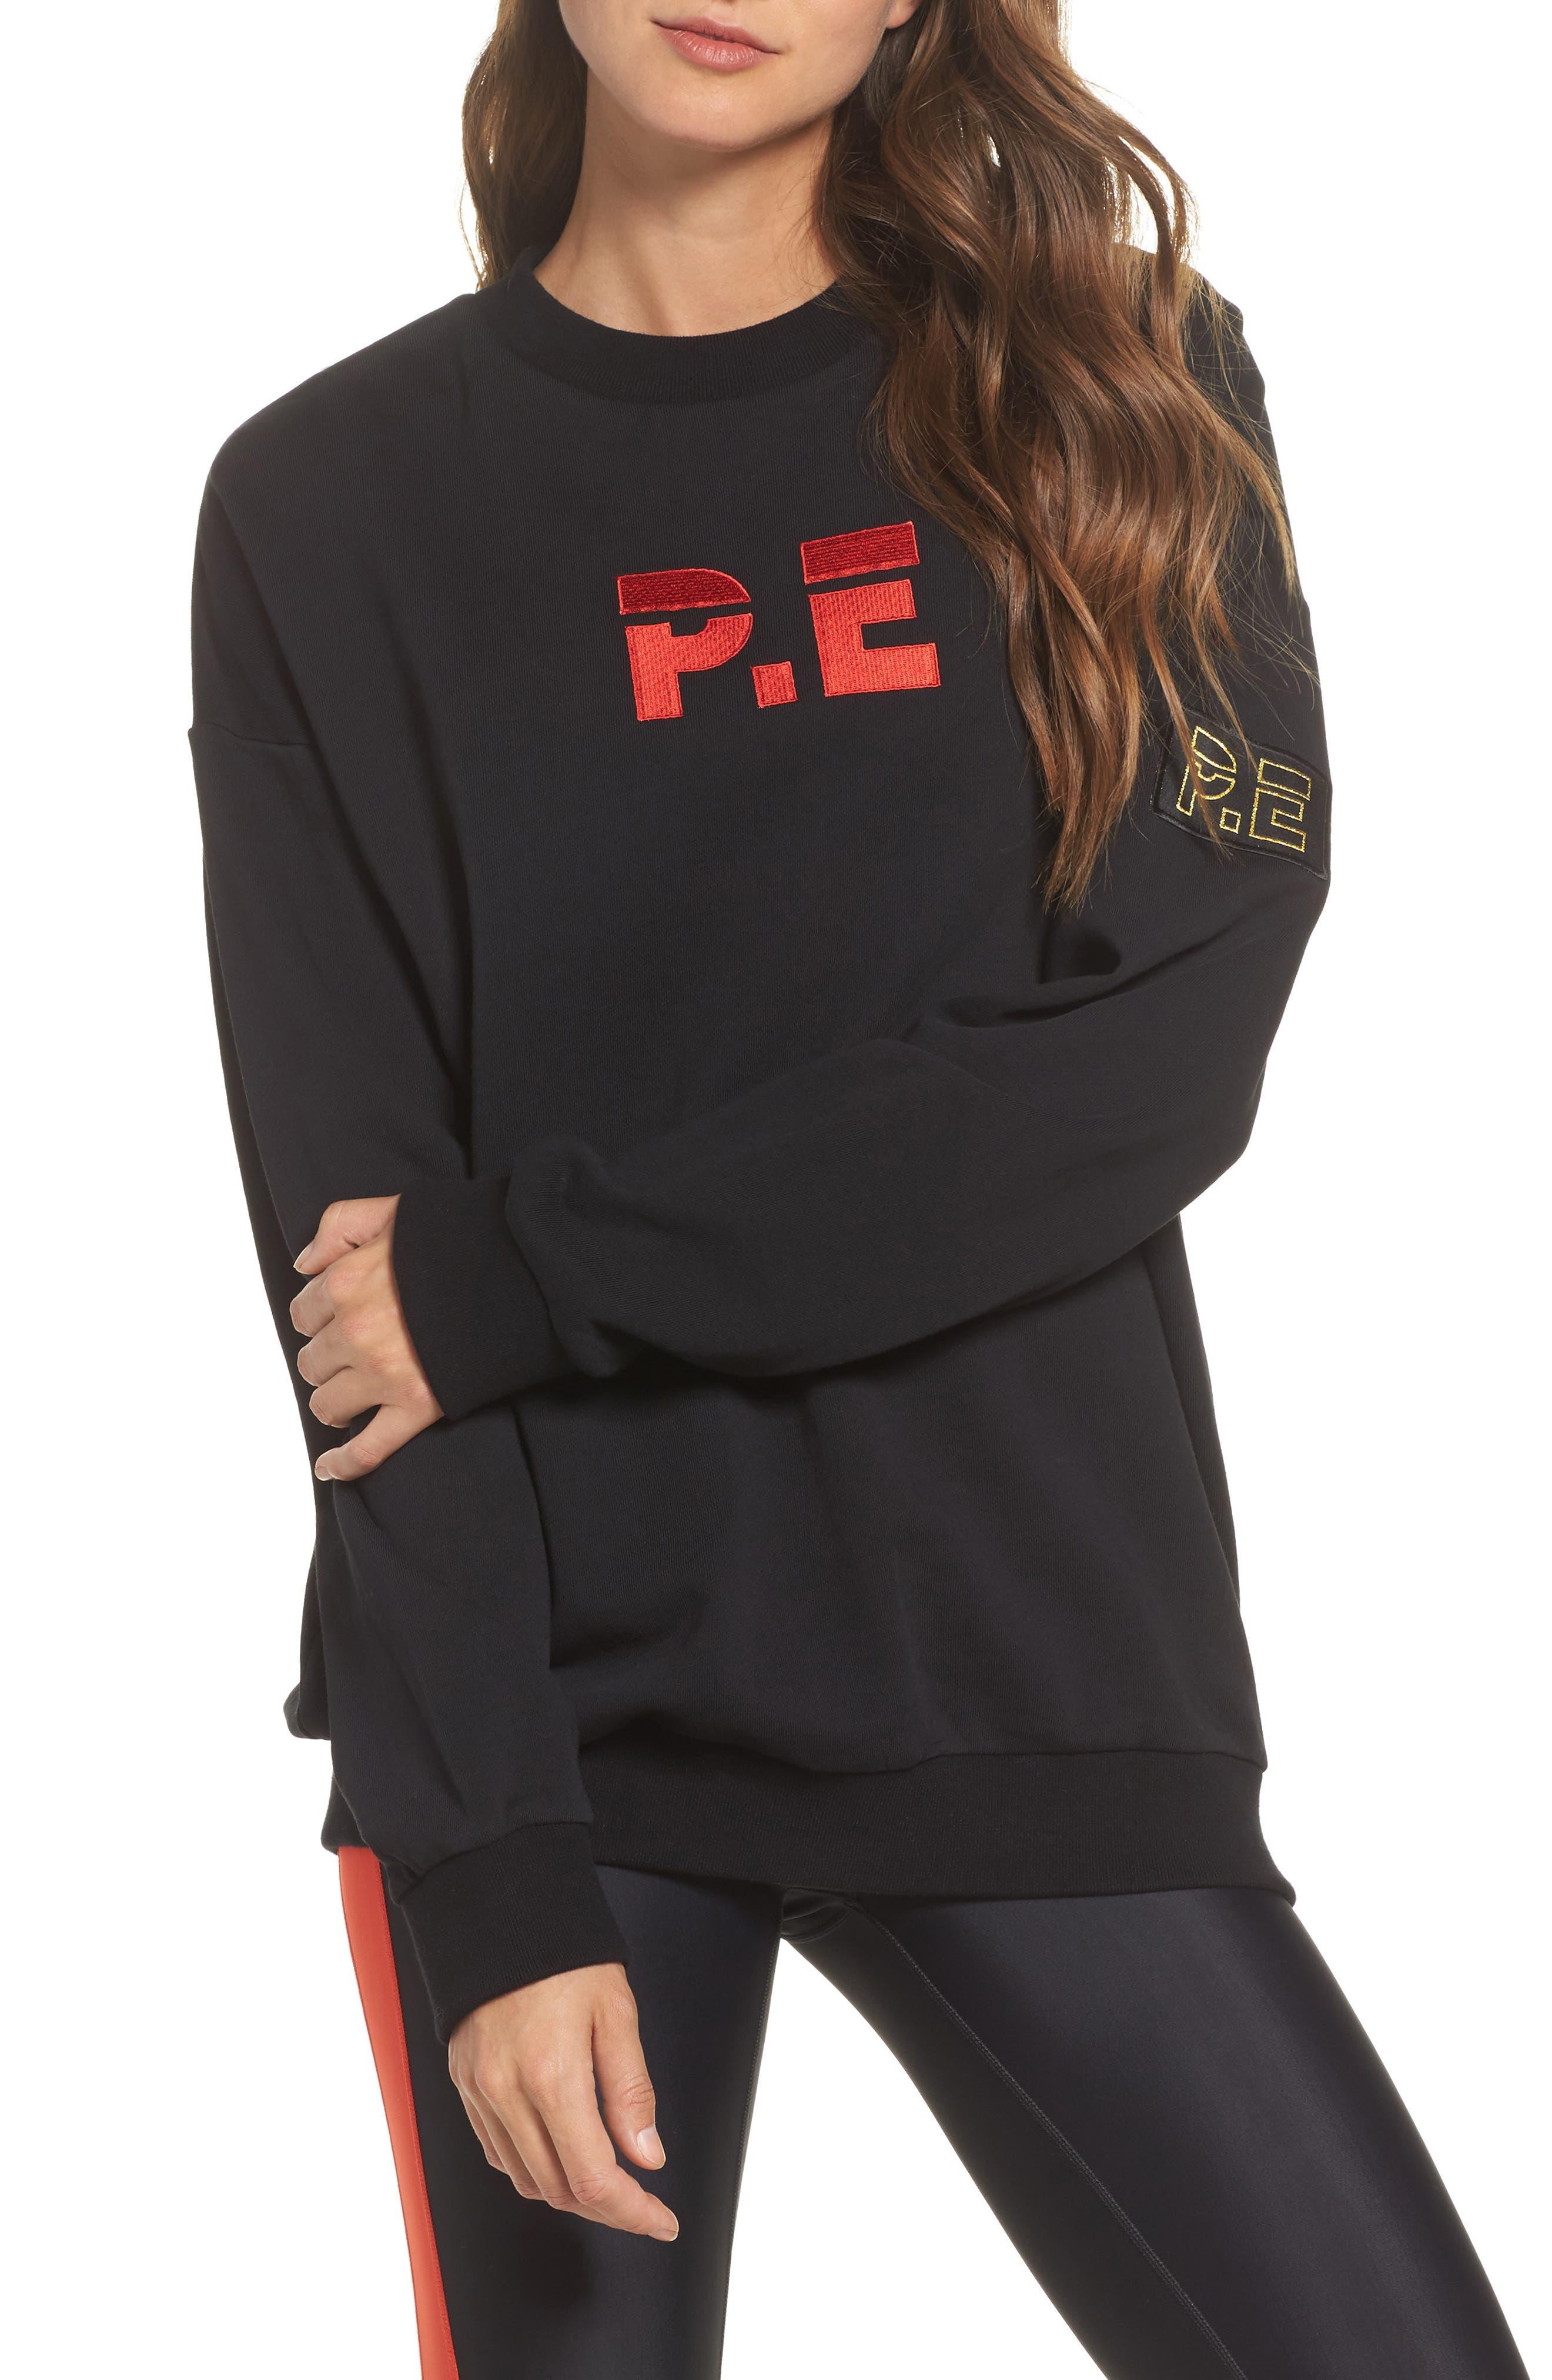 Get Set Sweatshirt,                         Main,                         color, Black